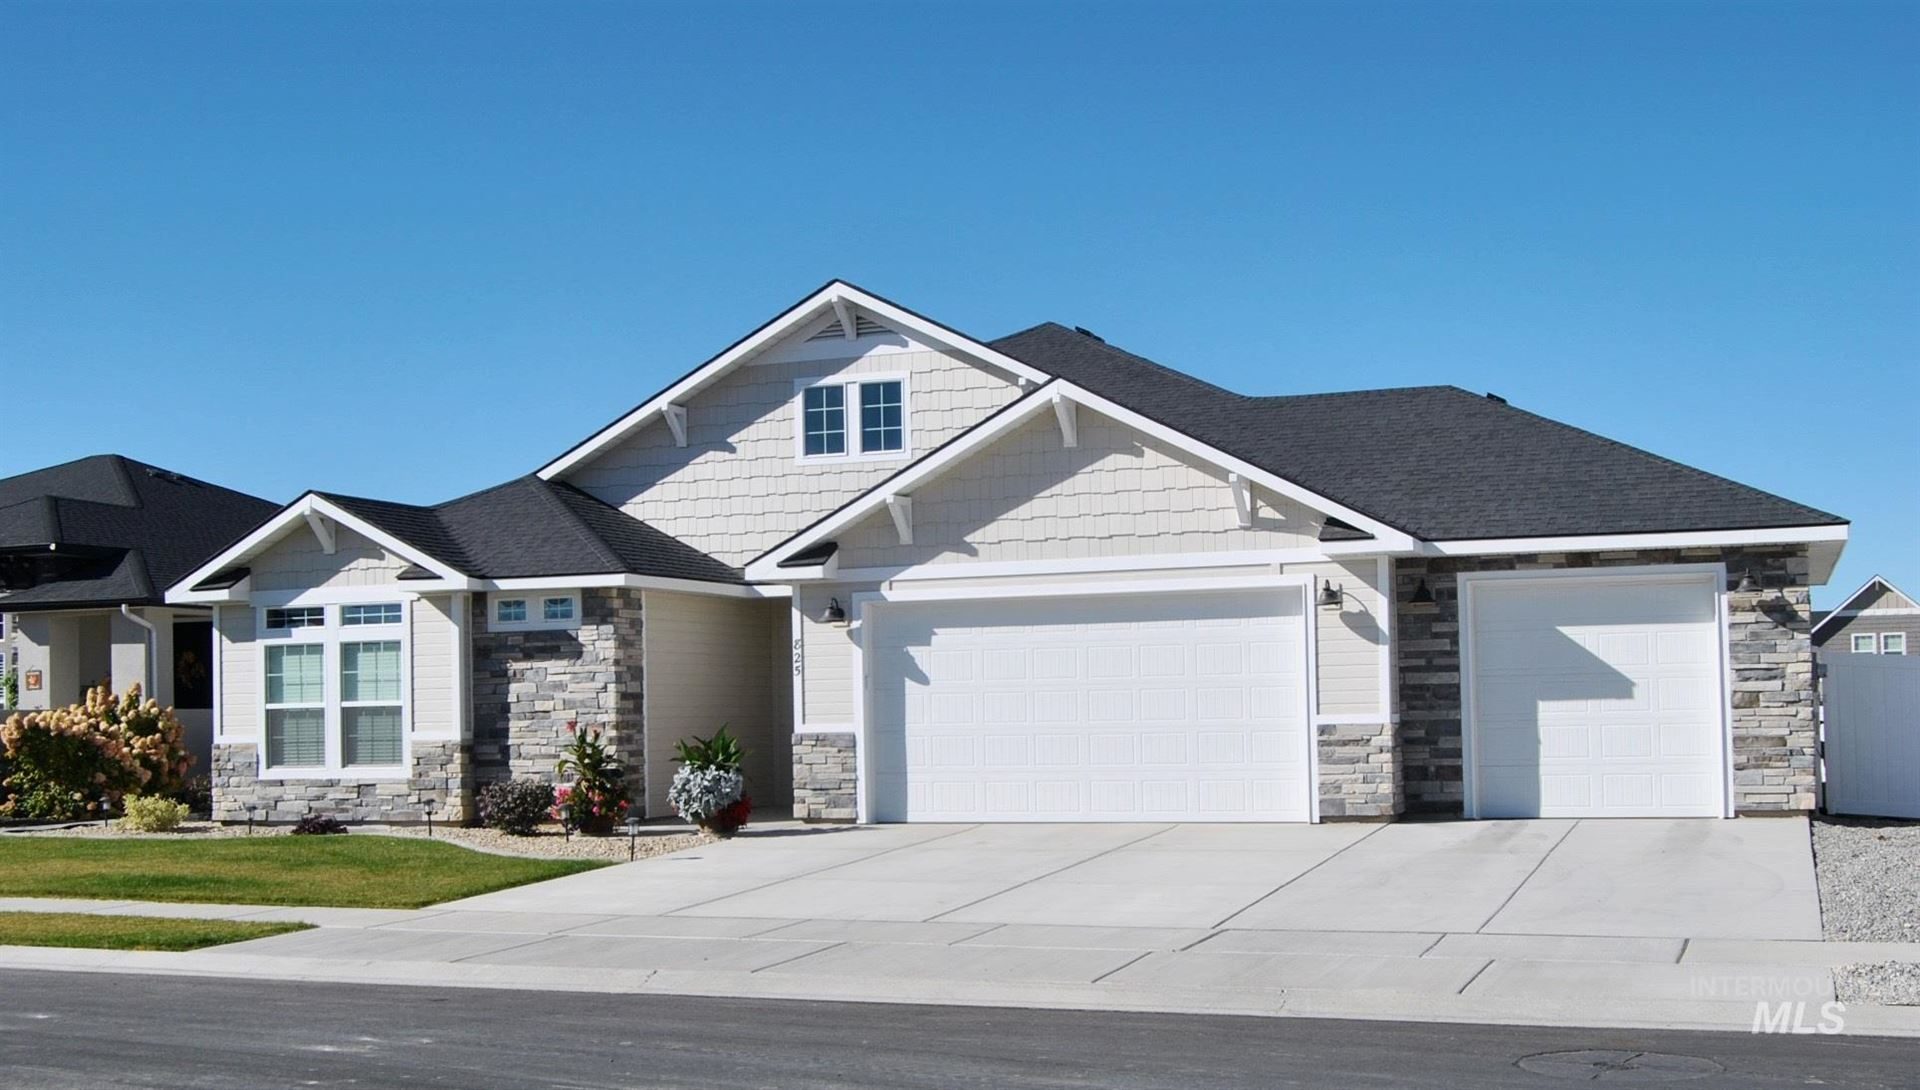 Photo of 825 Sunshine Drive, Twin Falls, ID 83301 (MLS # 98784373)